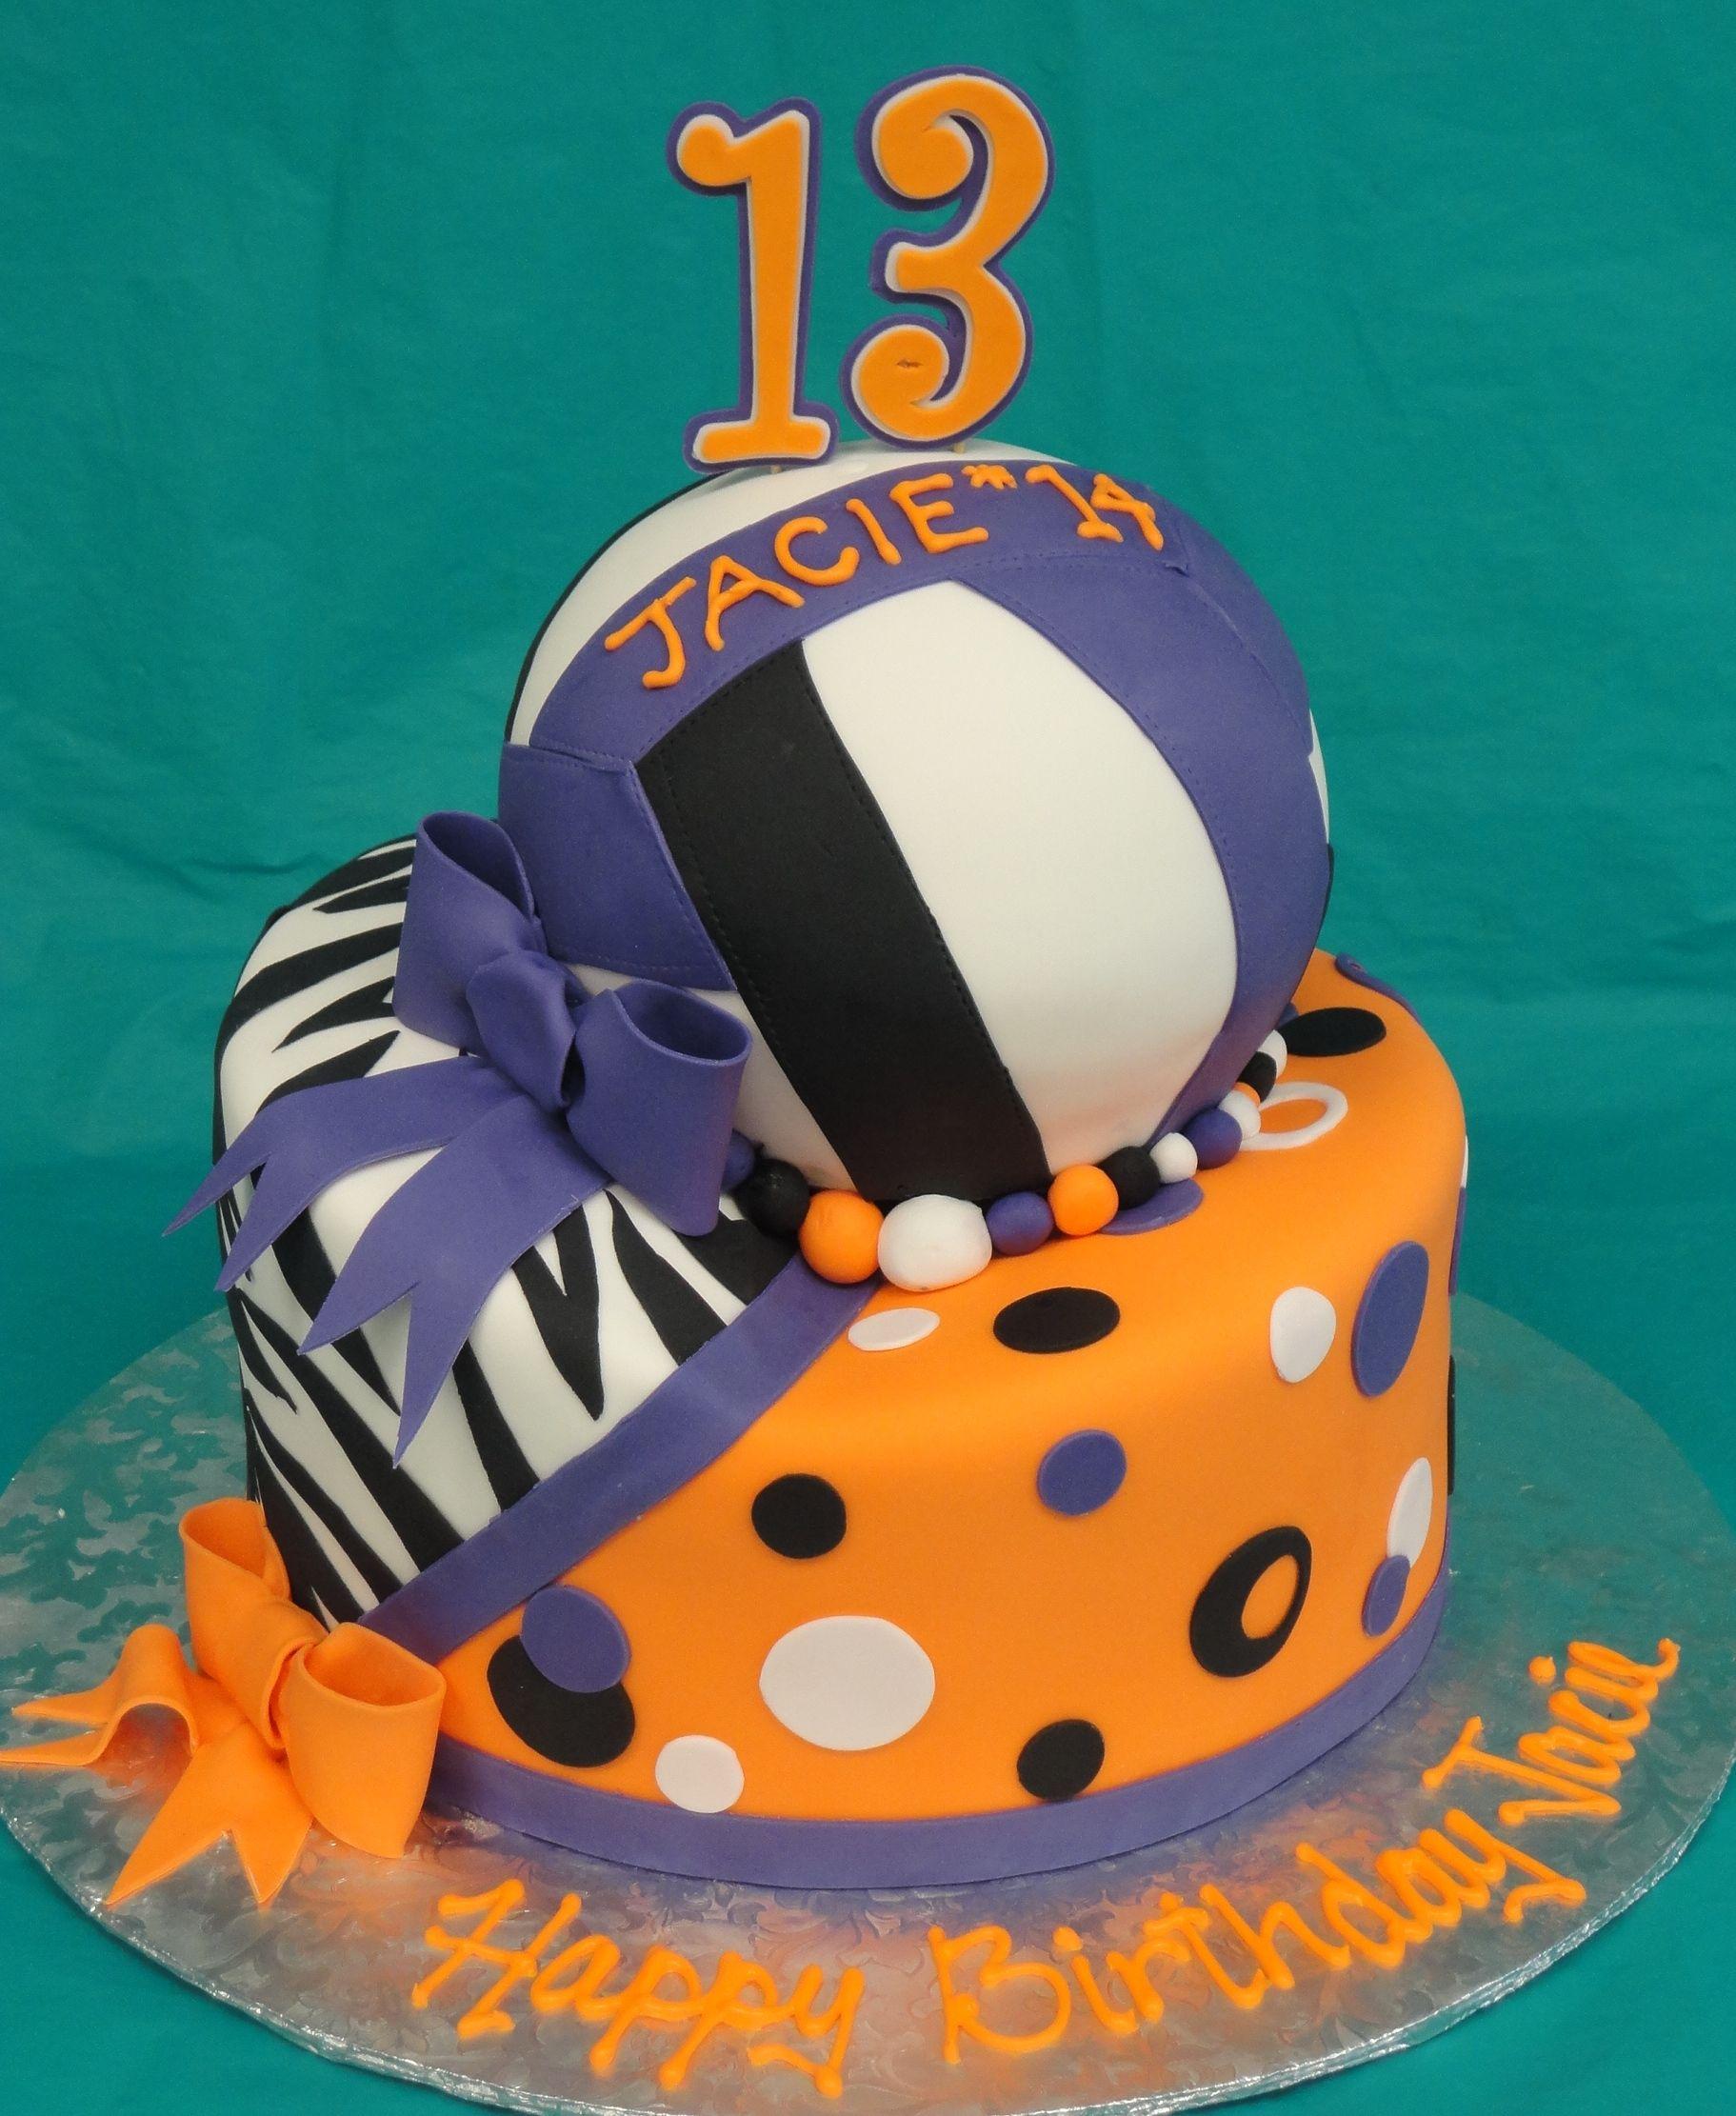 Pin By Christie Greene On Cakes Cakes Morecakes Volleyball Cakes Cake My Birthday Cake